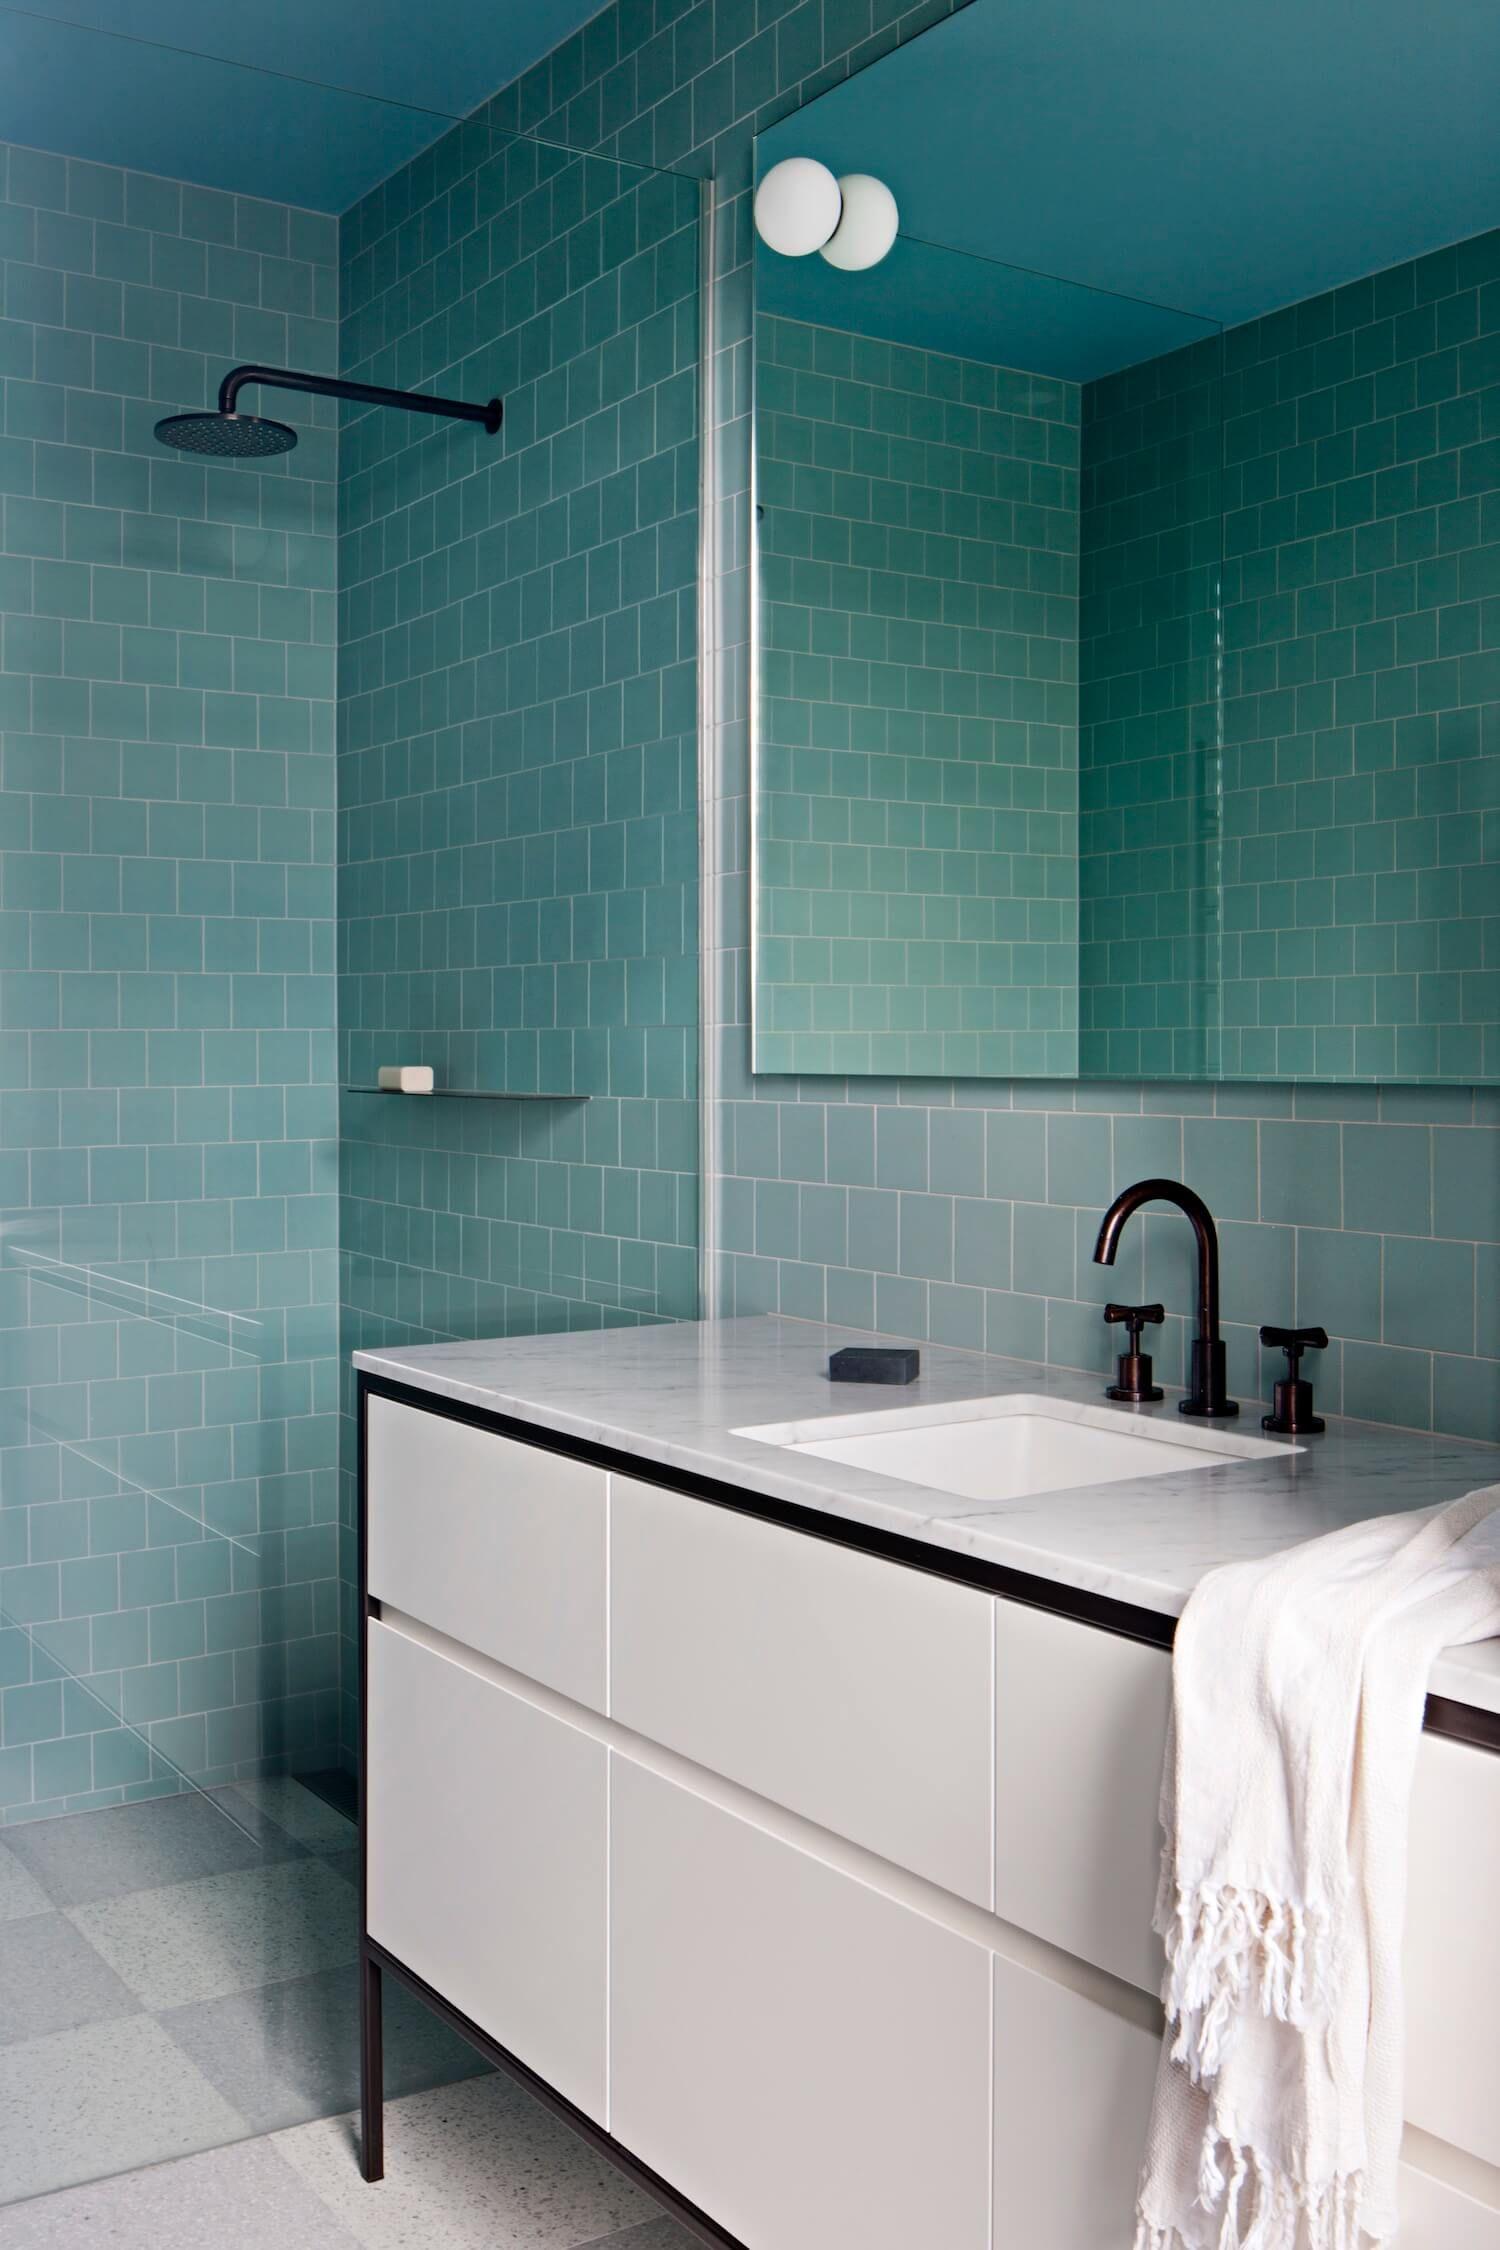 Open House: 23 The Grove Coburg | Bathrooms | Pinterest | Open house ...